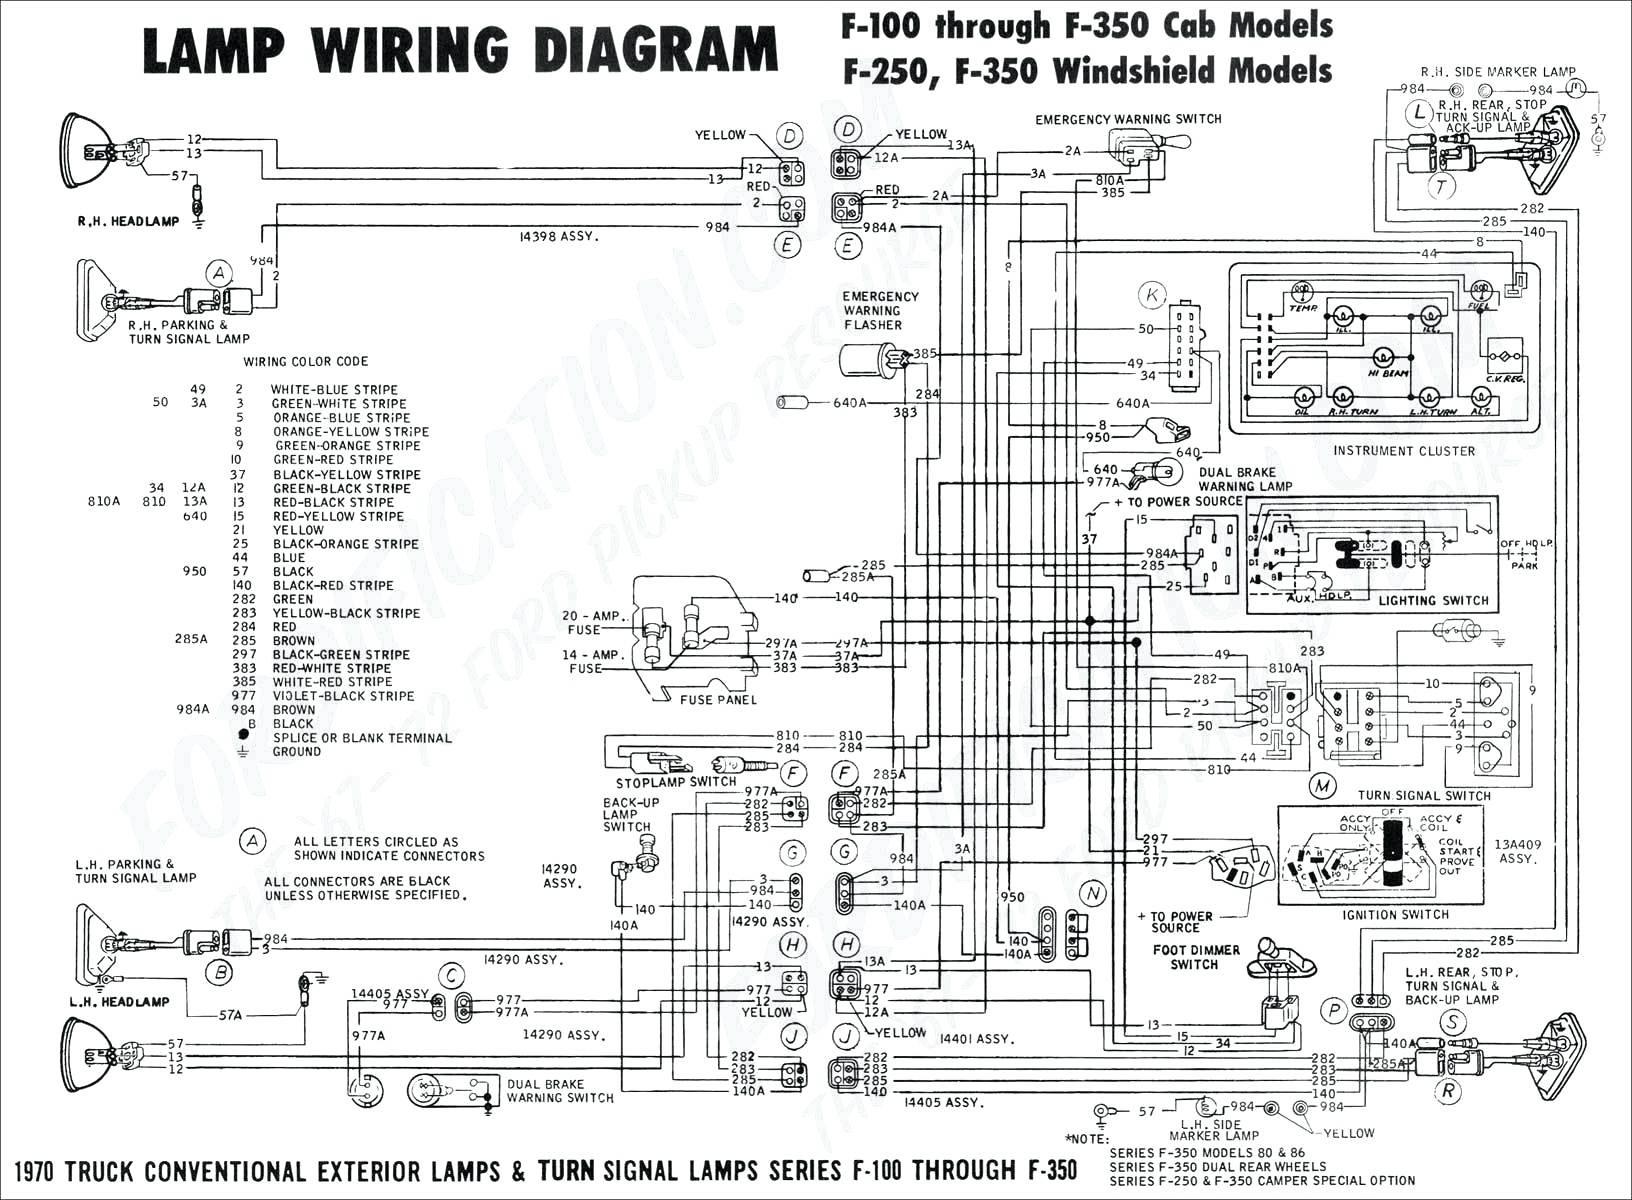 Electric Fuel Pump Relay Wiring Diagram Gm Fuel Pump